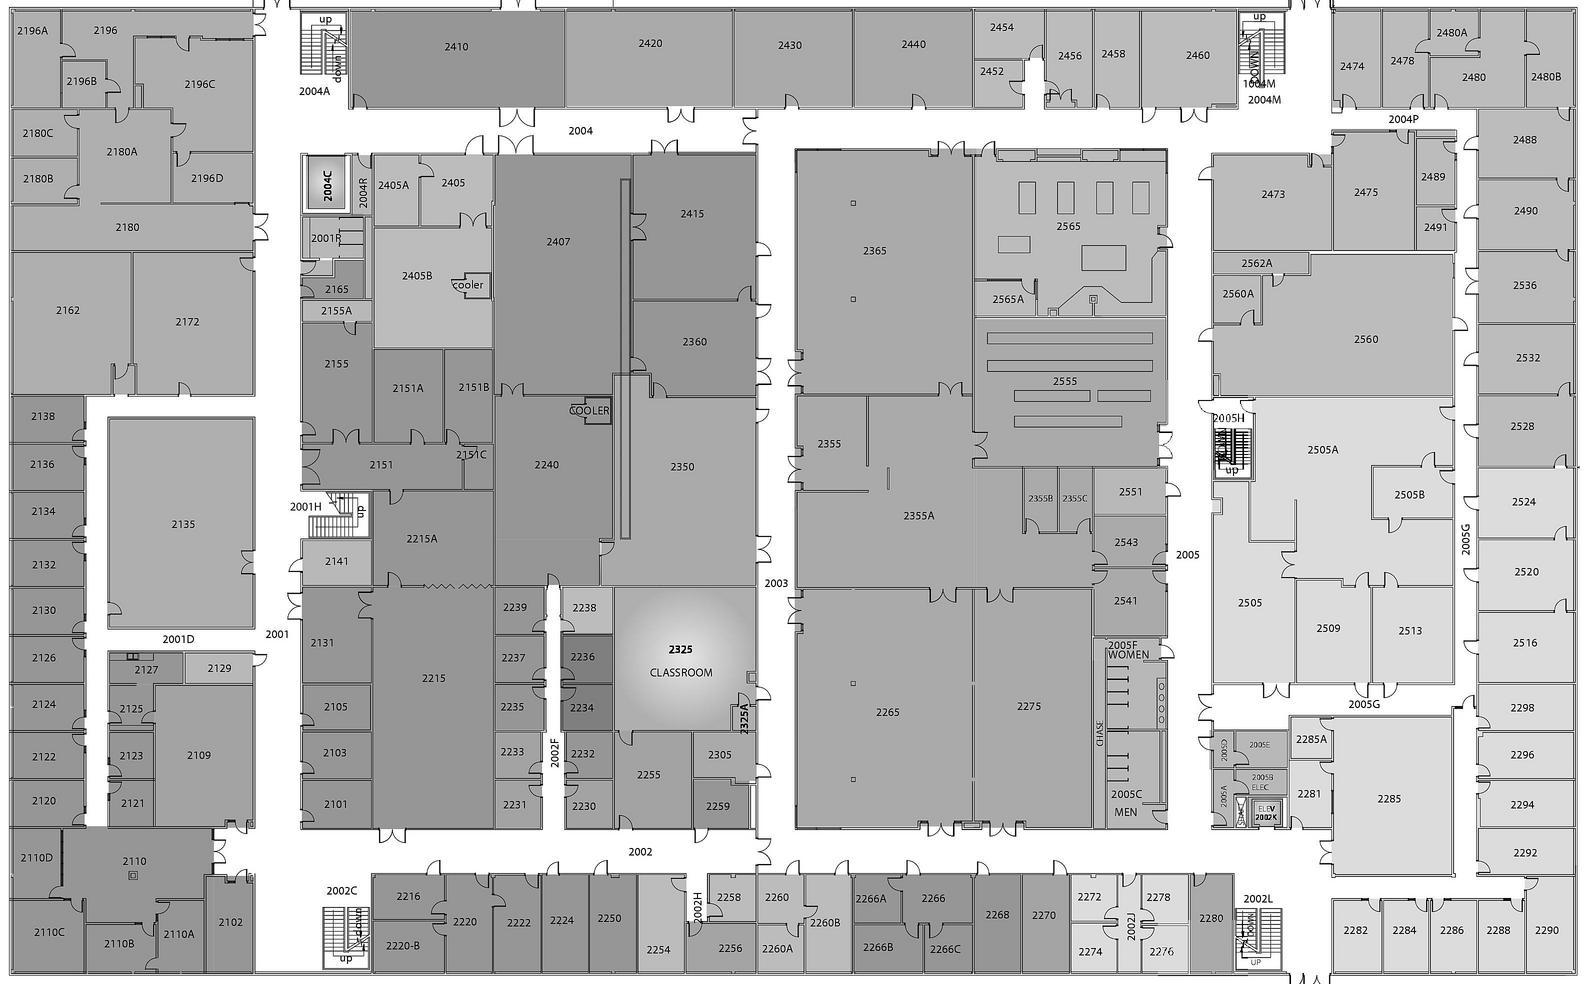 www/floormap/meb2fl-3.jpg